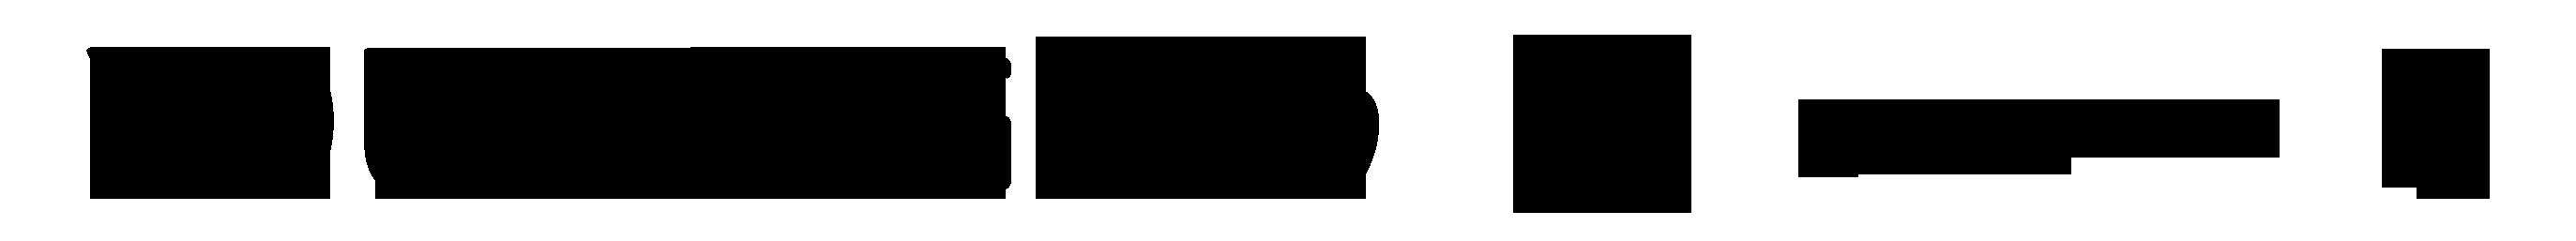 Youyang-lab